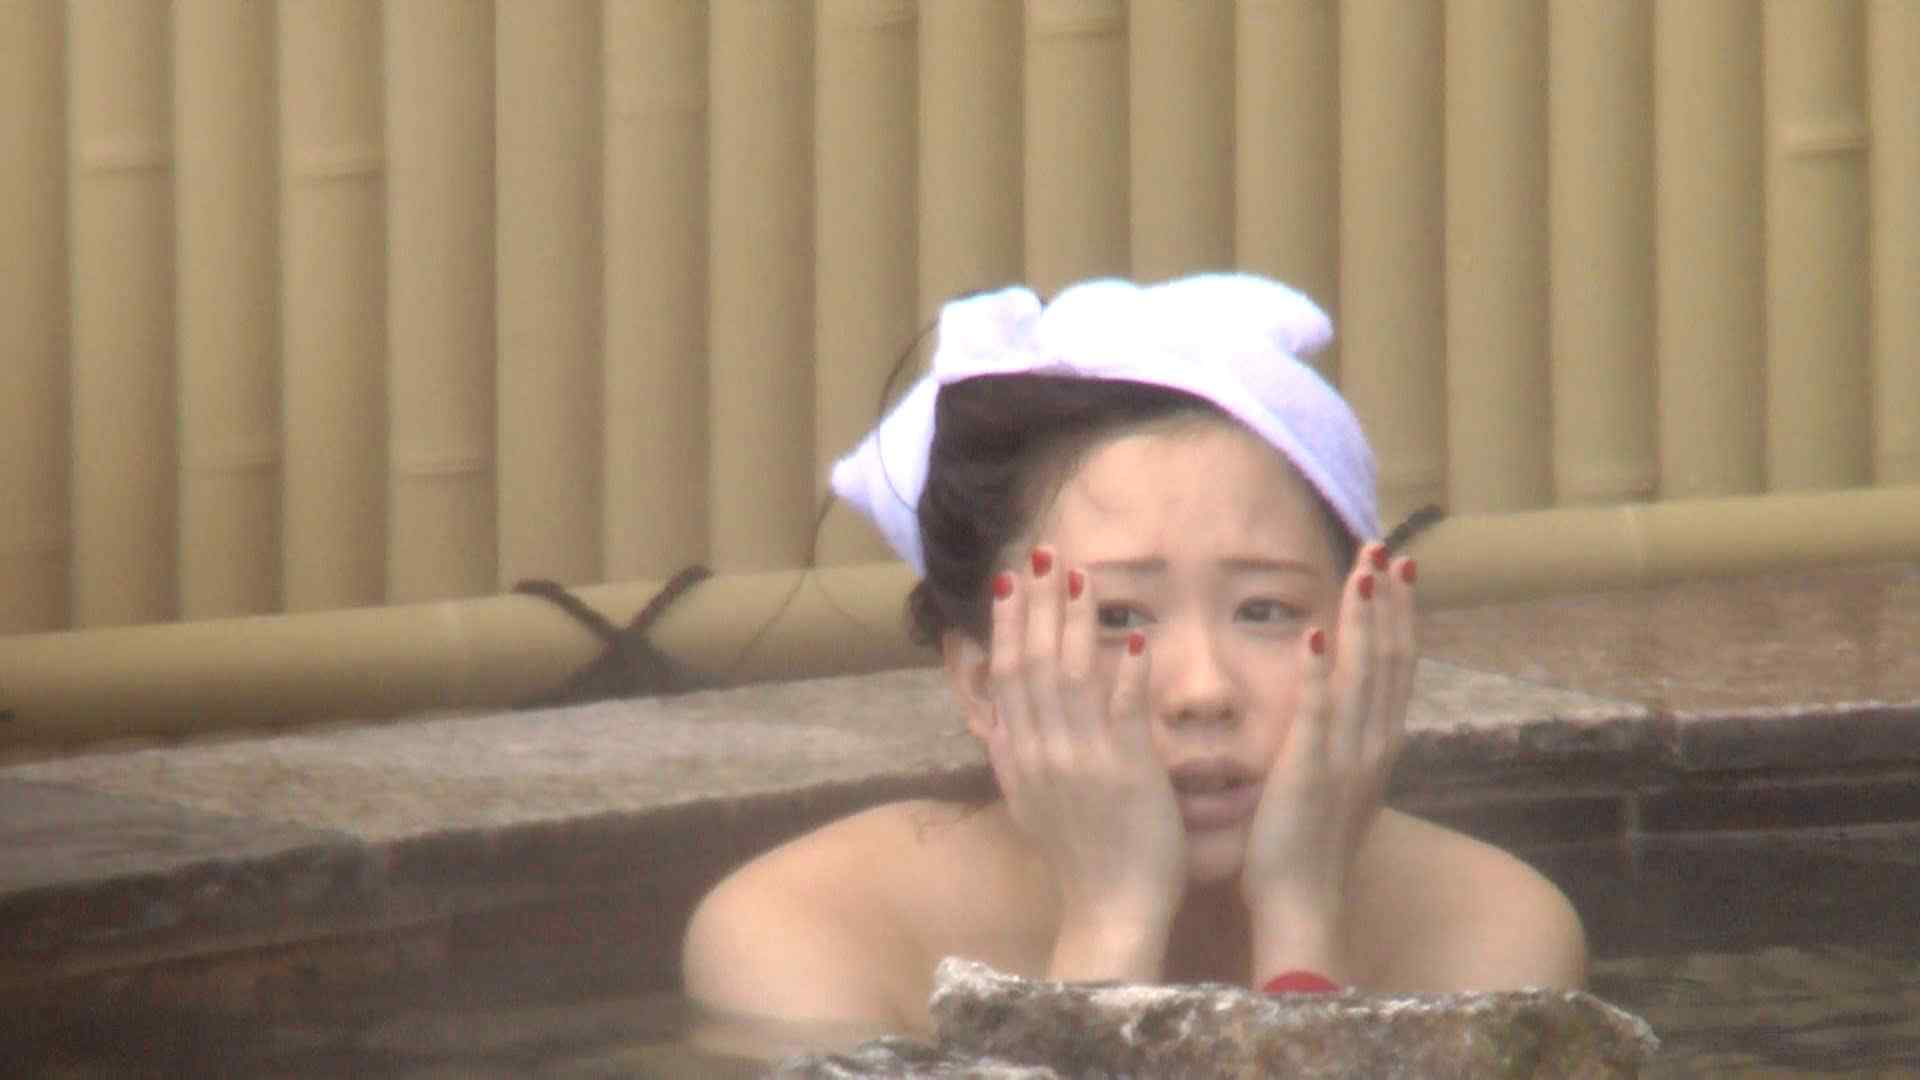 Aquaな露天風呂Vol.211 0  16連発 16